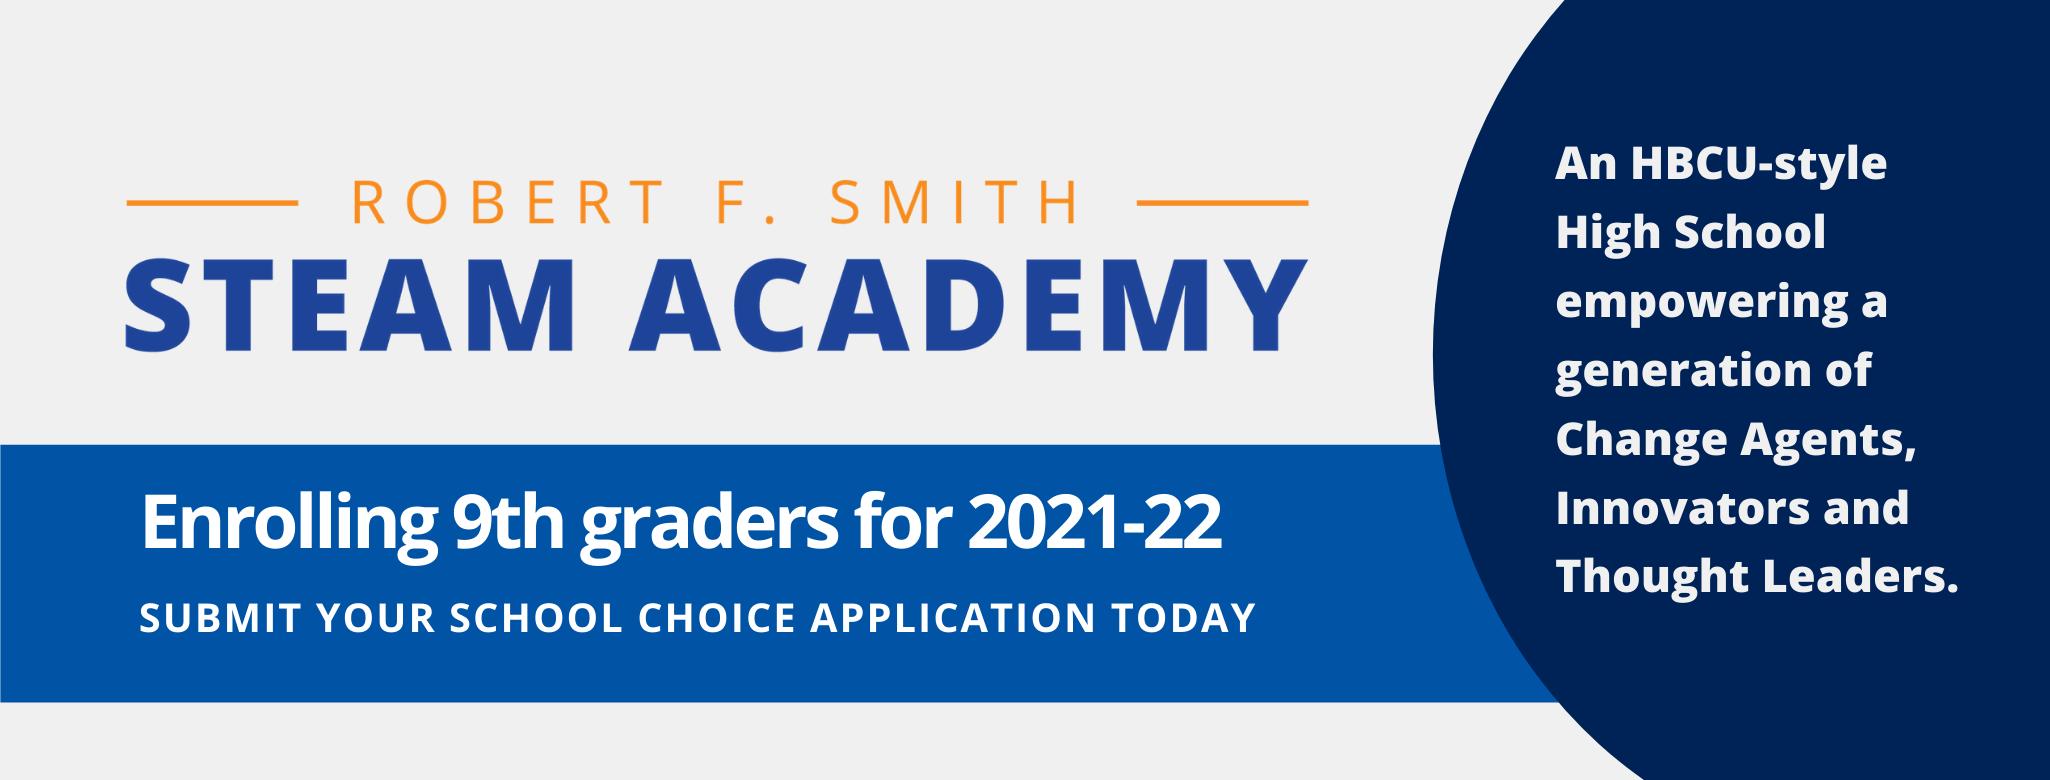 Robert F Smith STEAM Academy